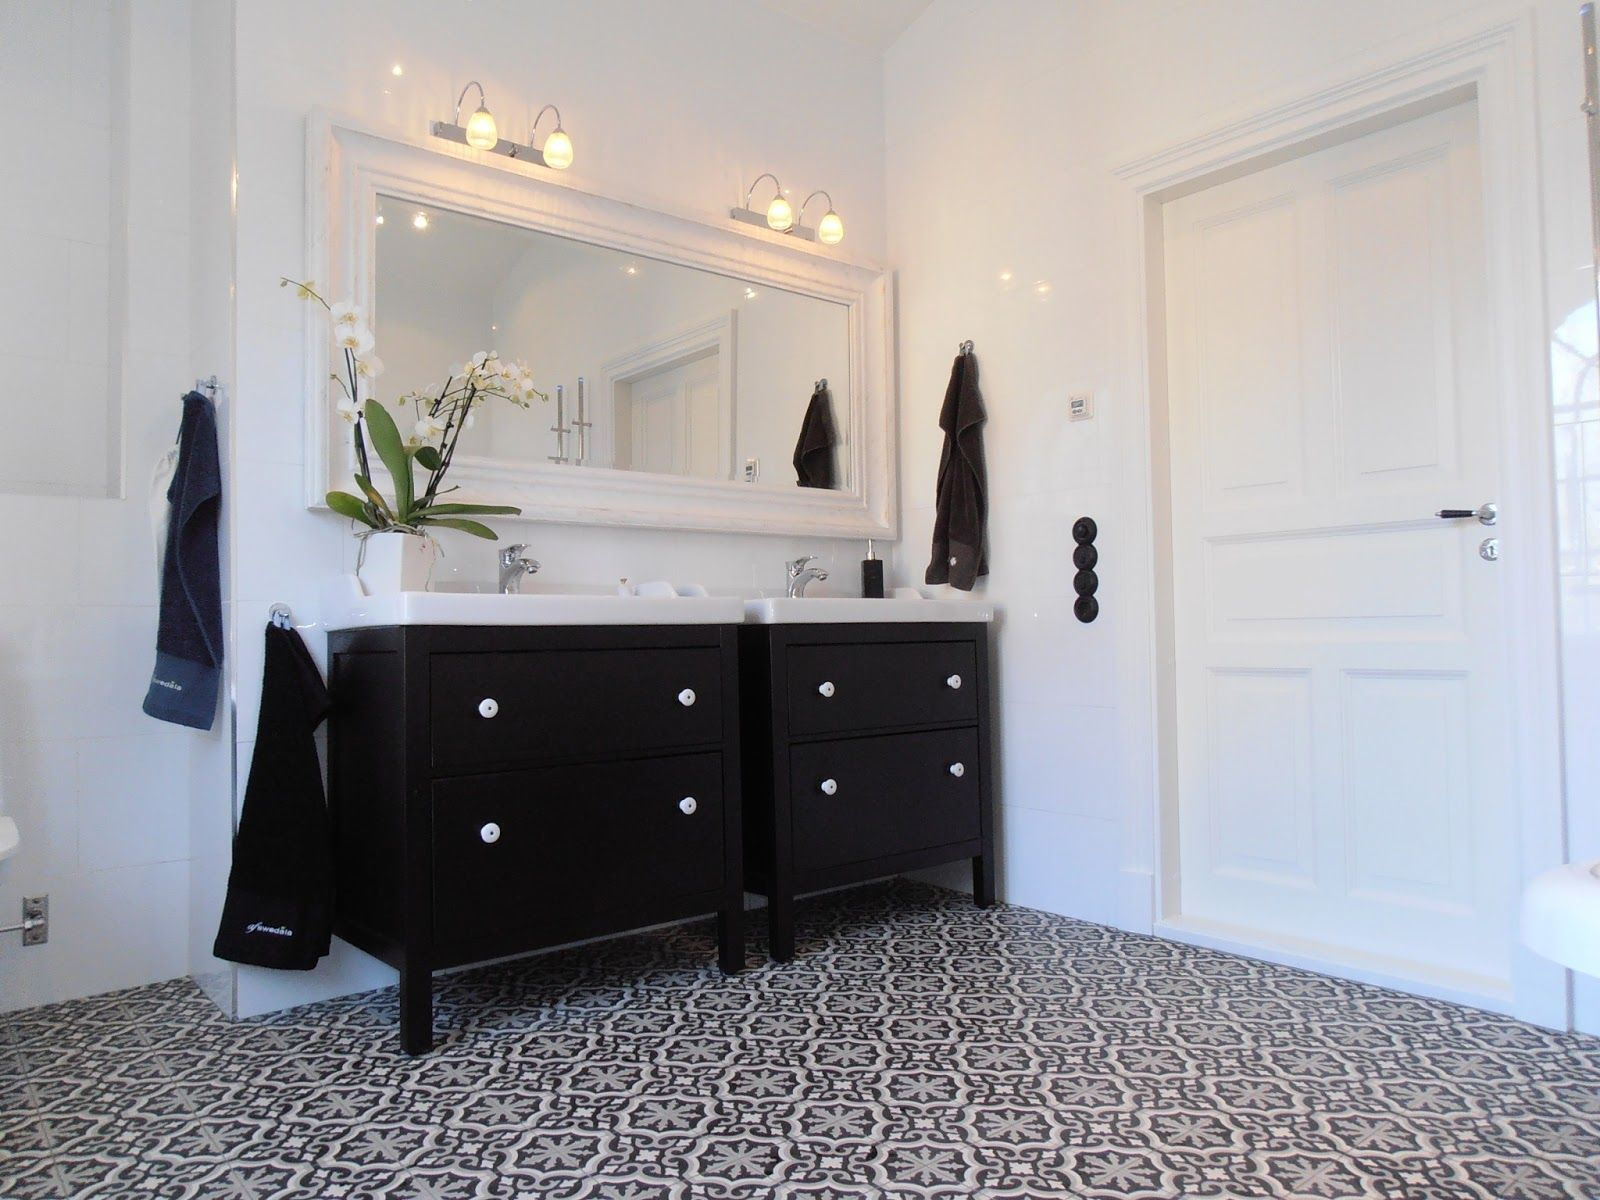 Hemnes Bad luxury moroccan tiles and a white hemnes bathroom more bathroom